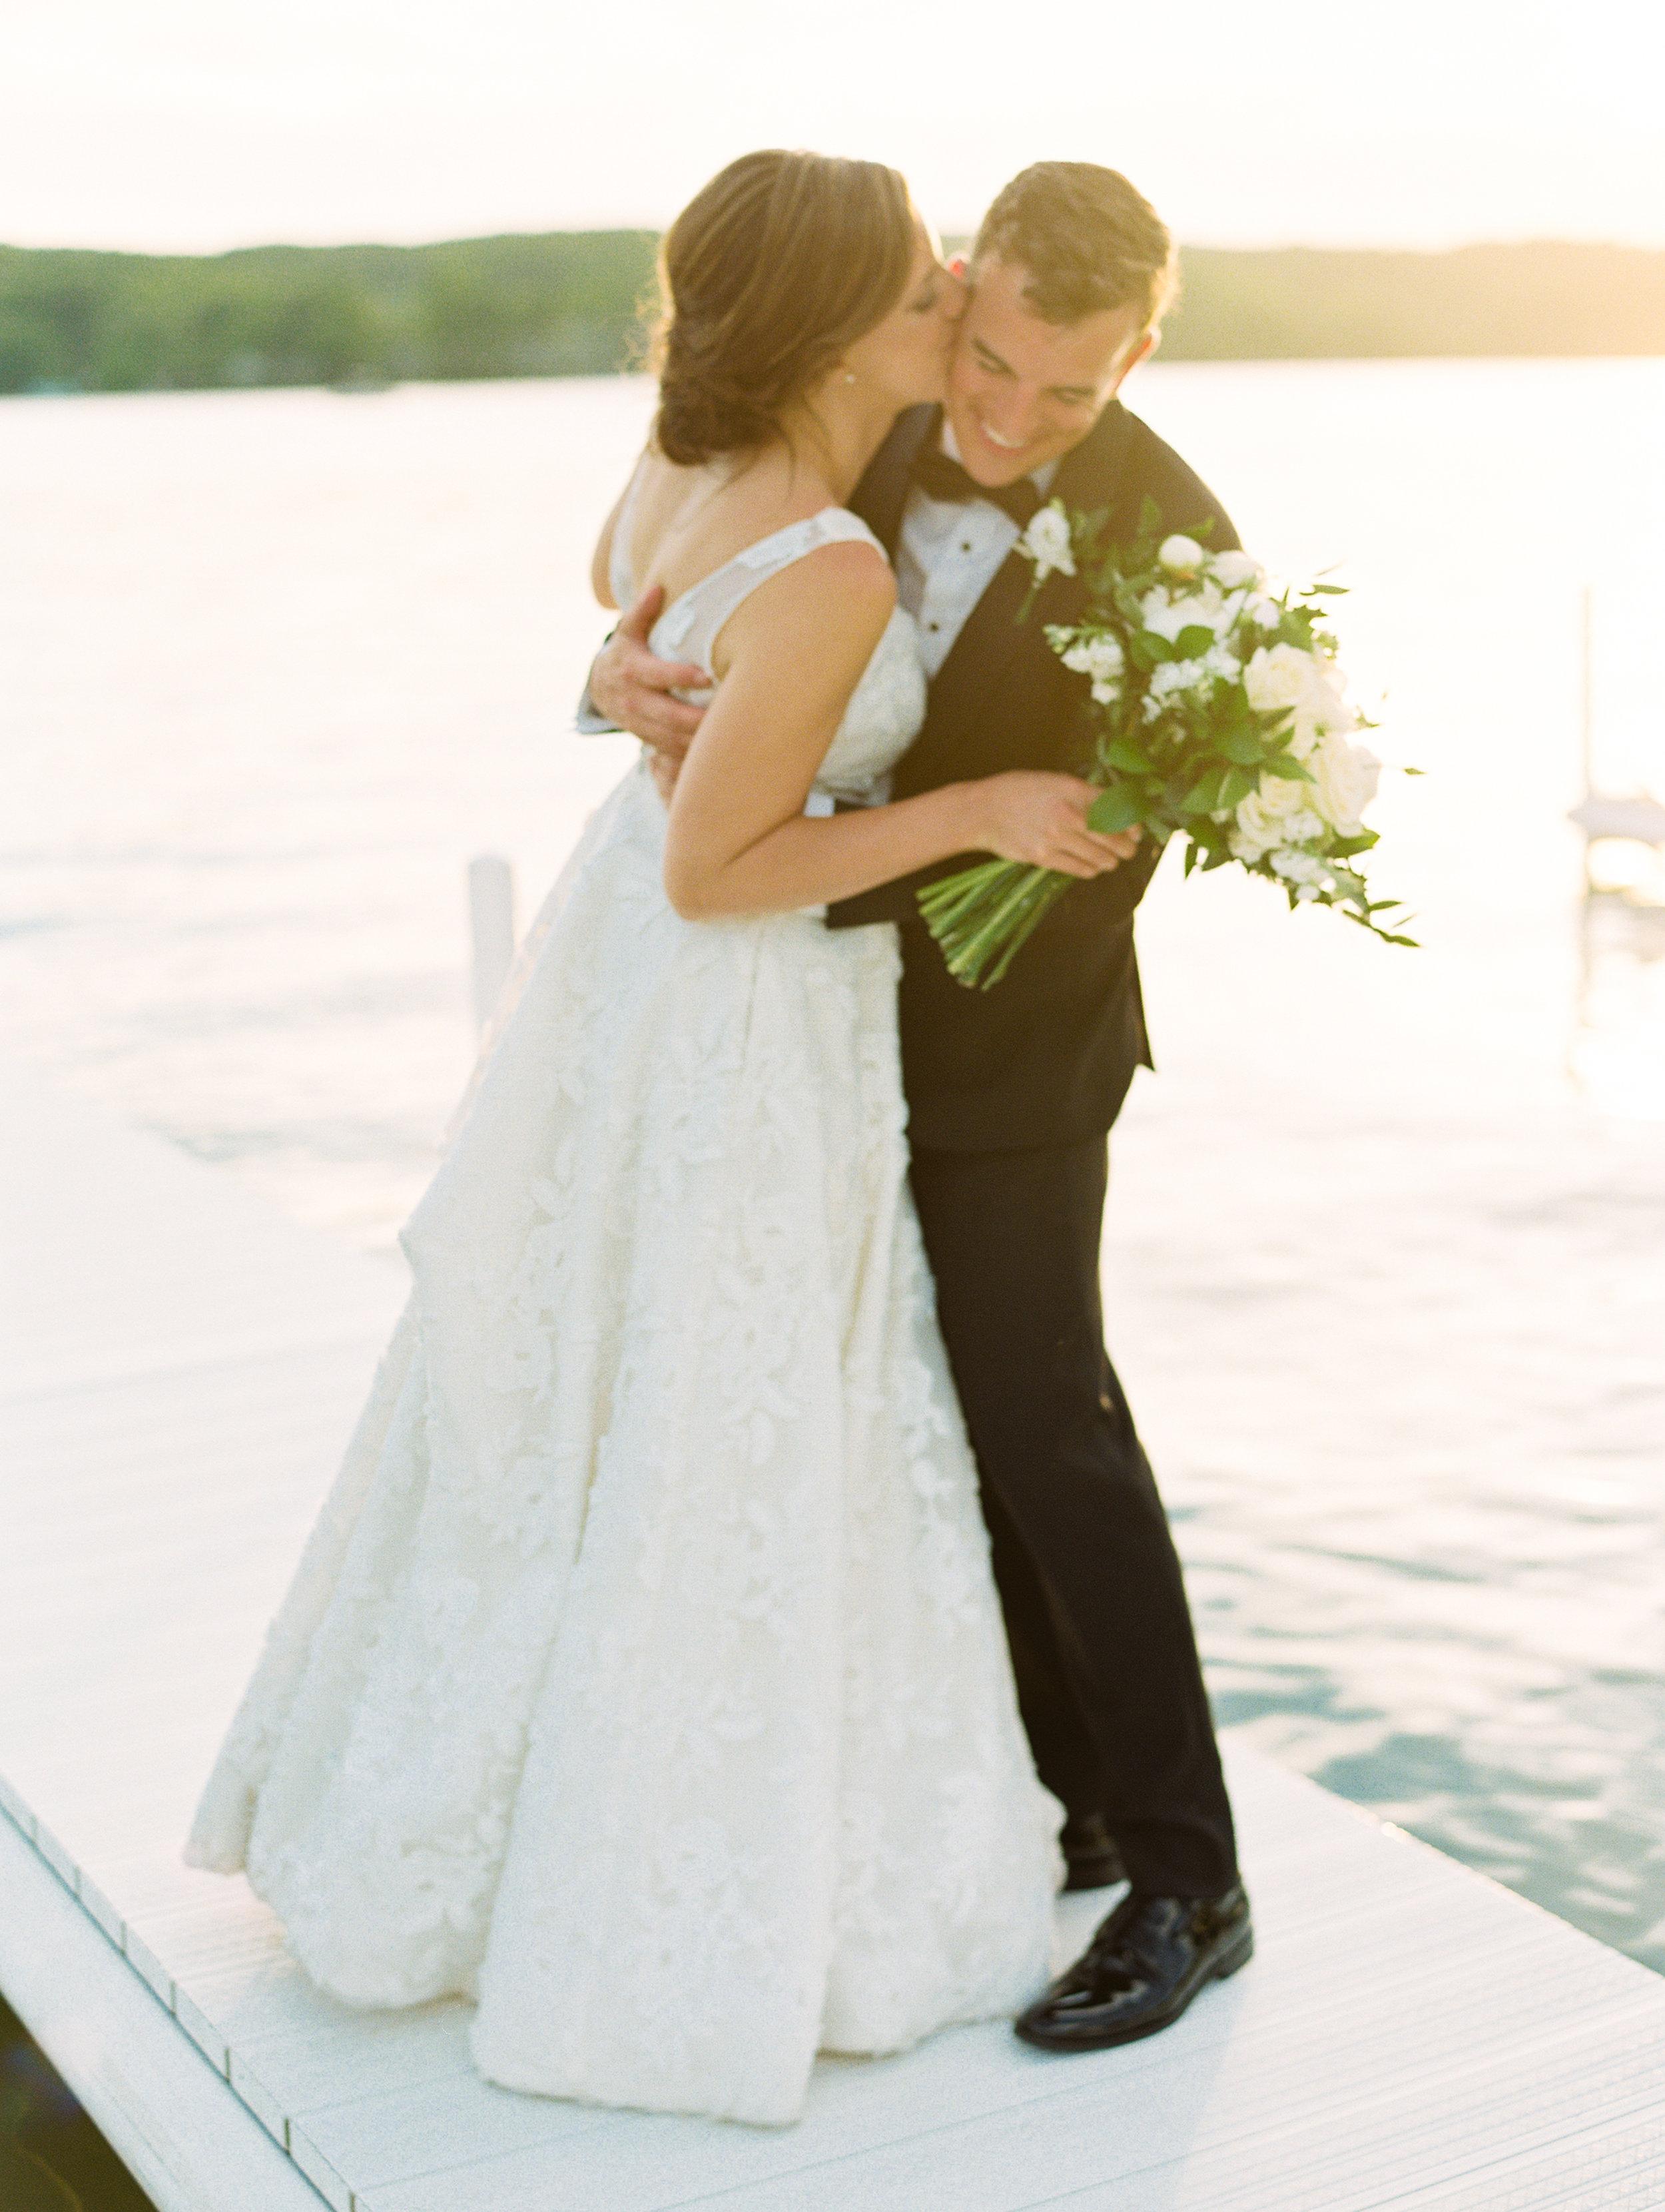 DeGuilio+Wedding+BrideGroomSunsetf-21.jpg